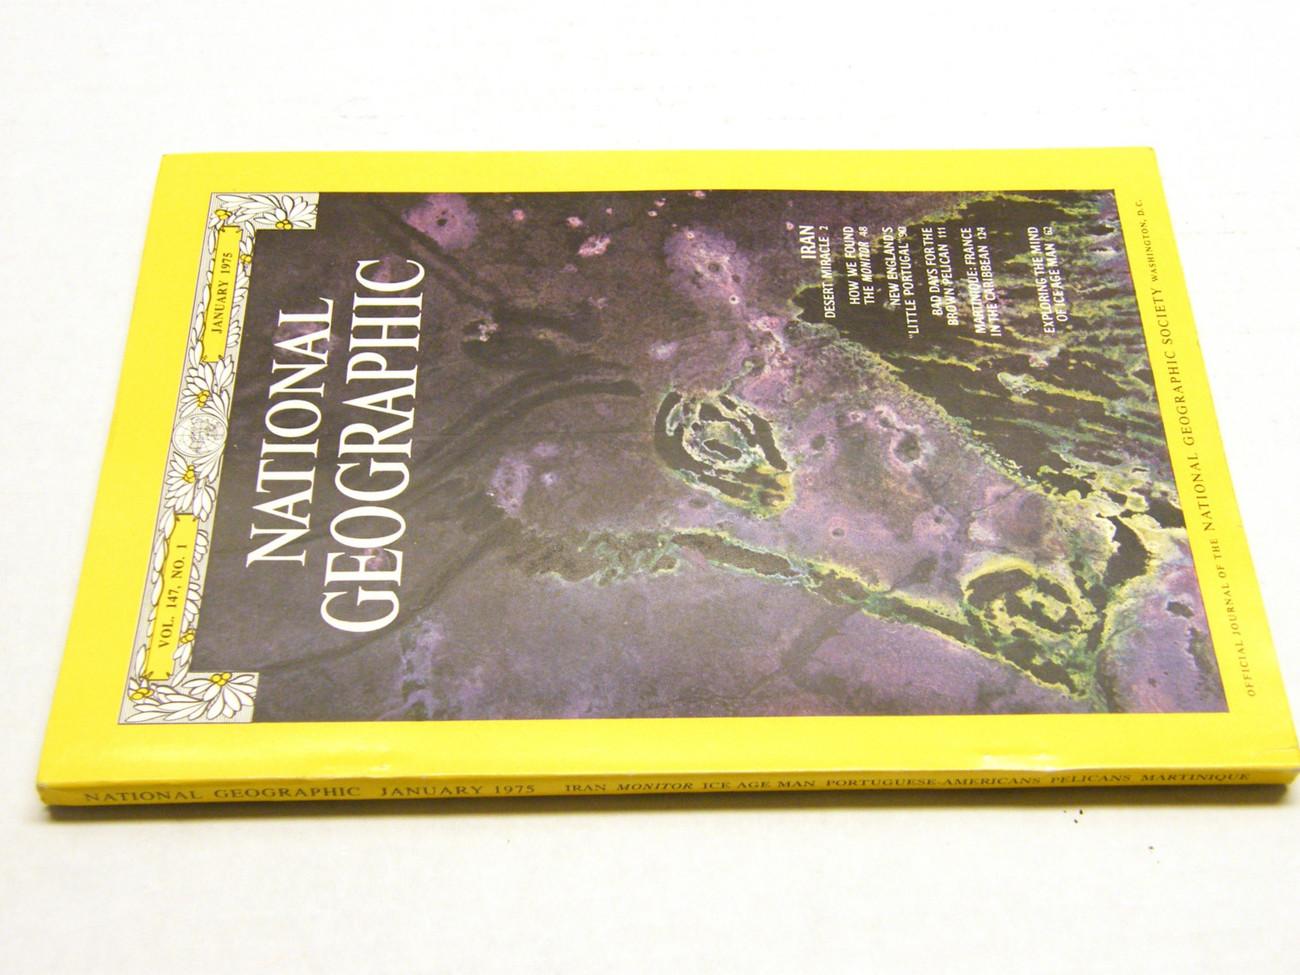 Set of 3 Vintage 1975 National Geographic (Jan/Feb/Mar)